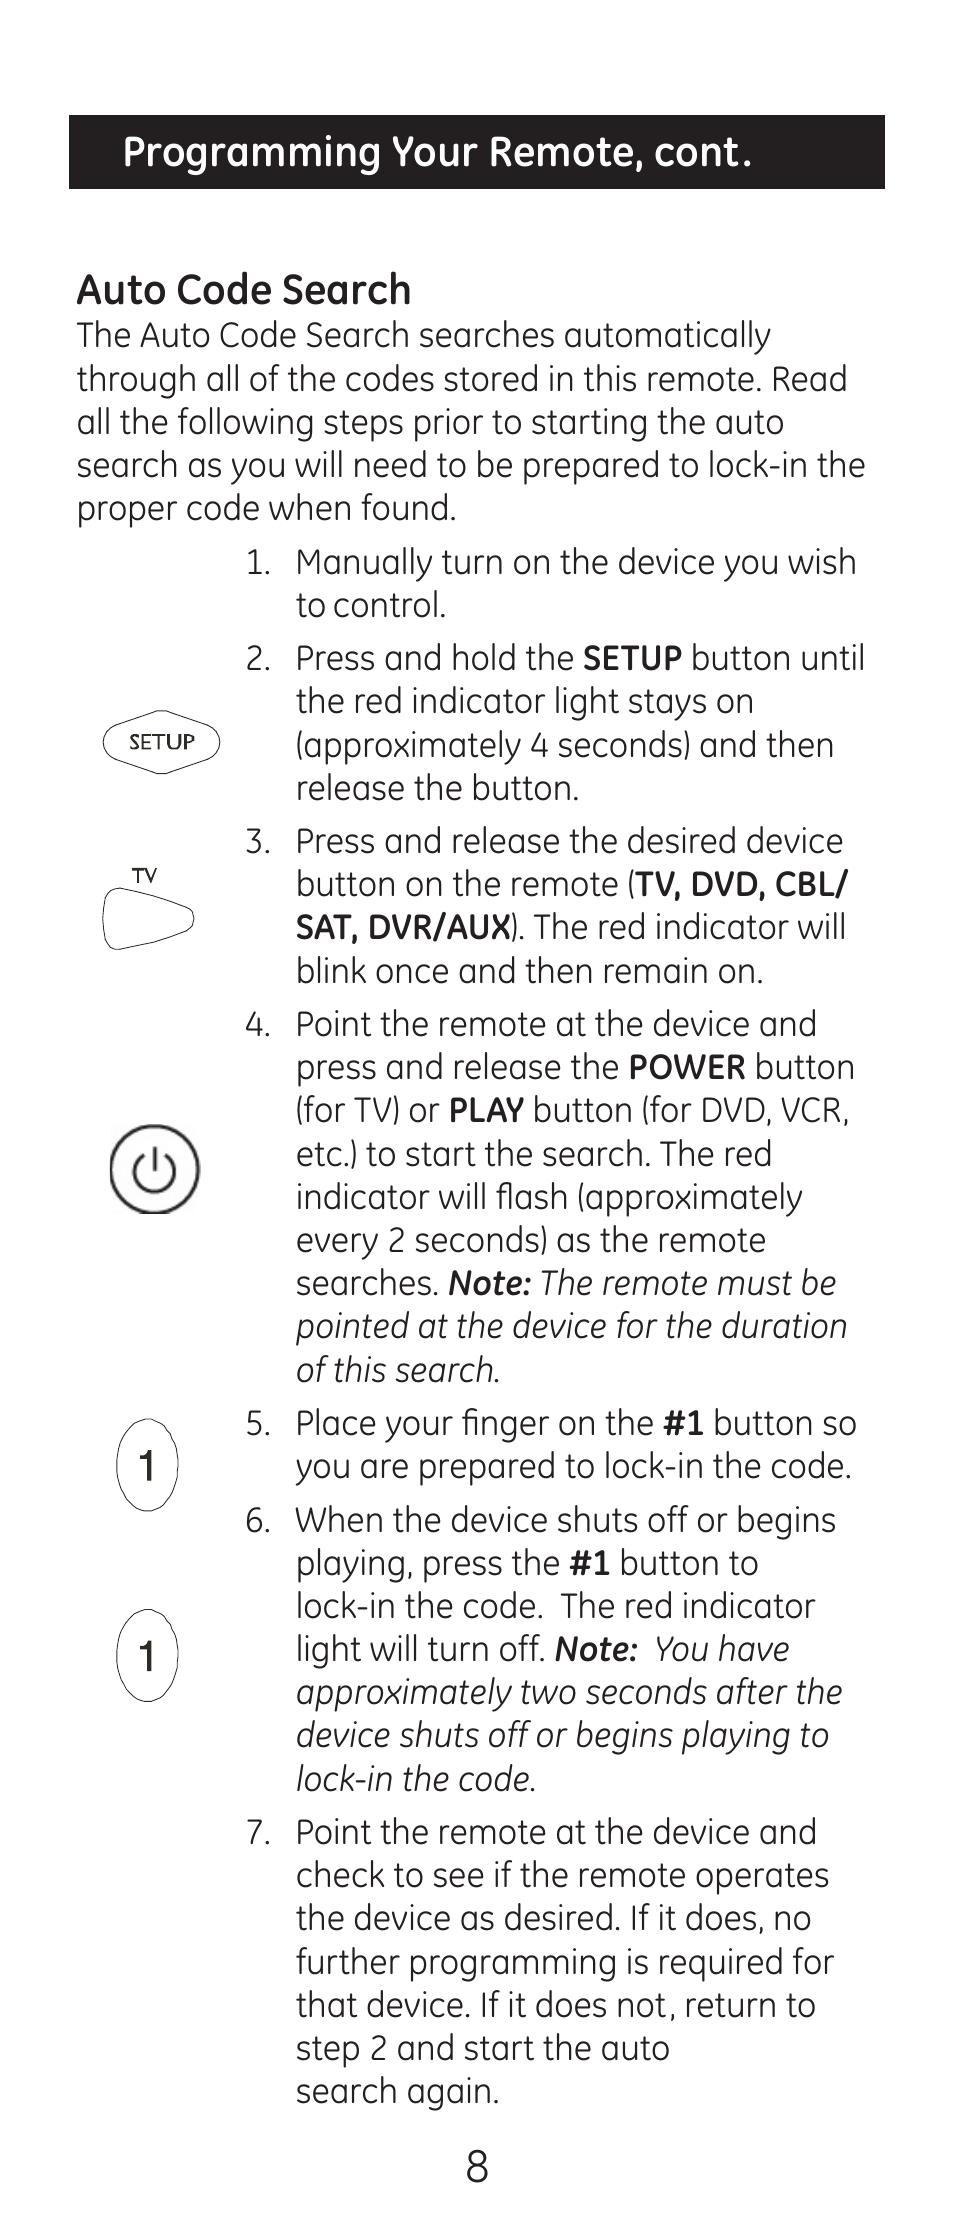 GE Universal Remote Codes | GE Universal Remote Manuals